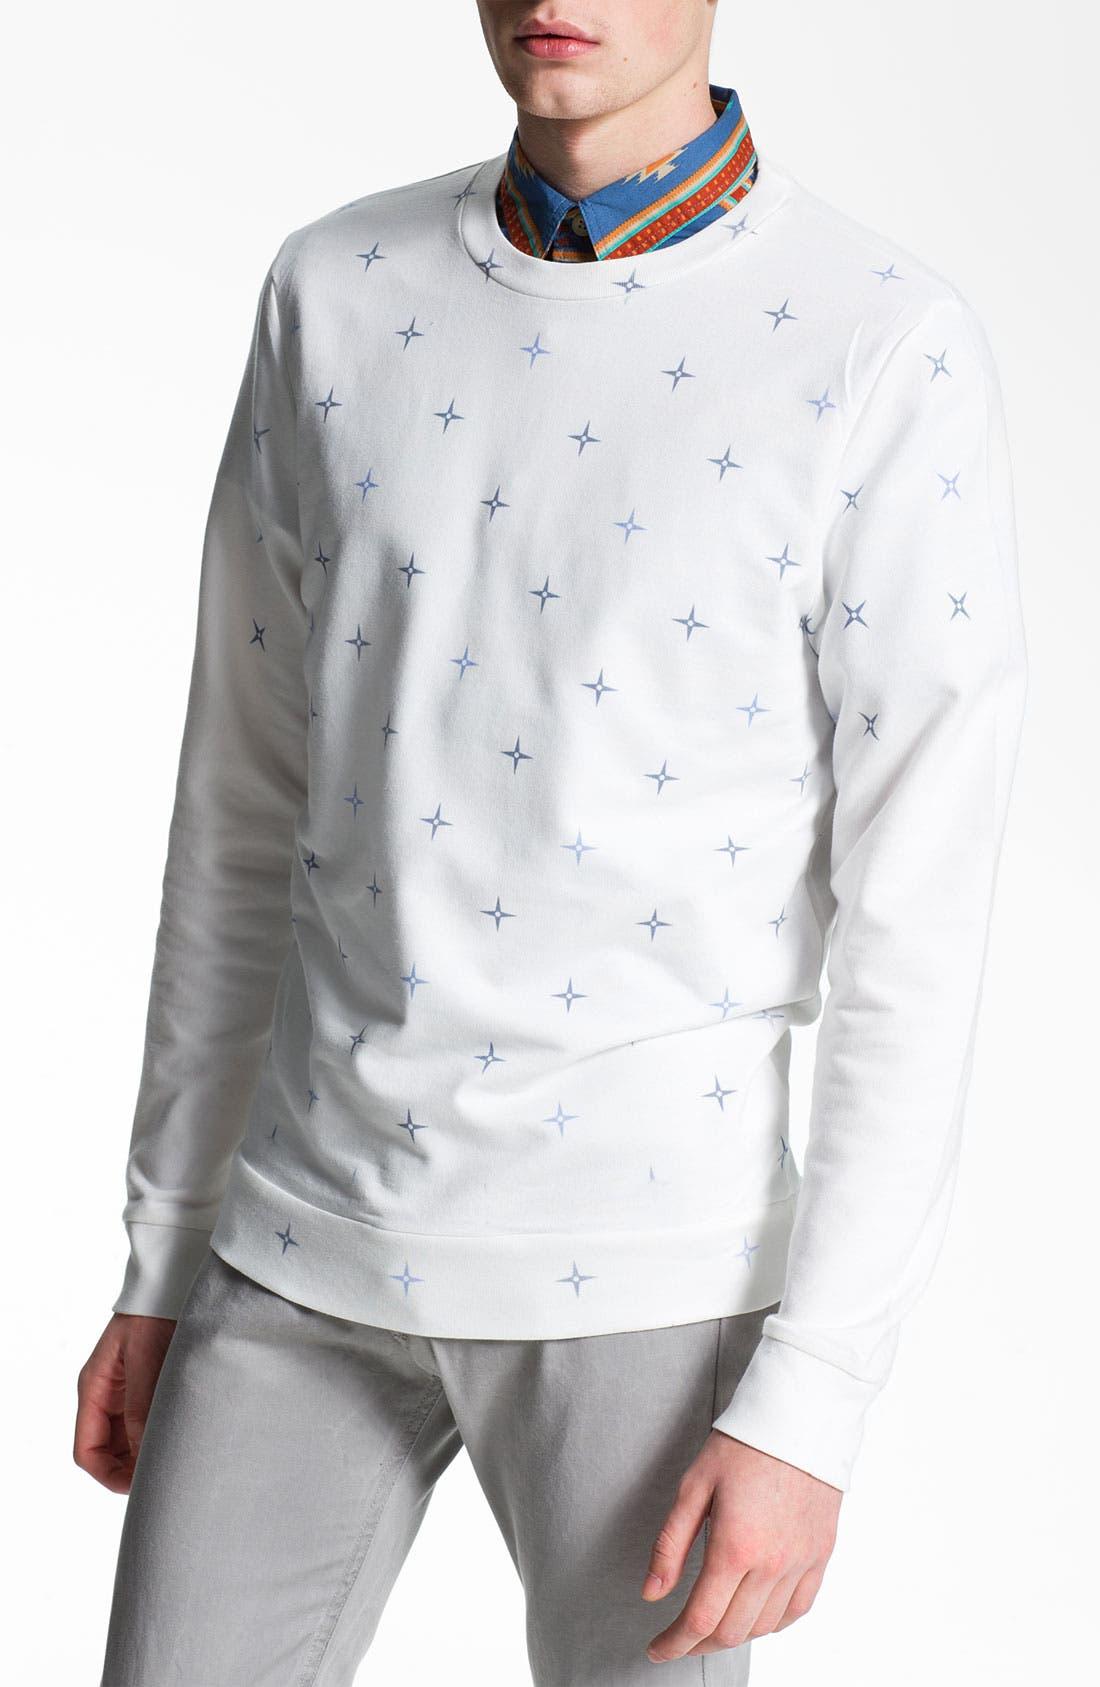 Main Image - Topman All Over Star Pattern Crewneck Sweatshirt (Nordstrom Exclusive)